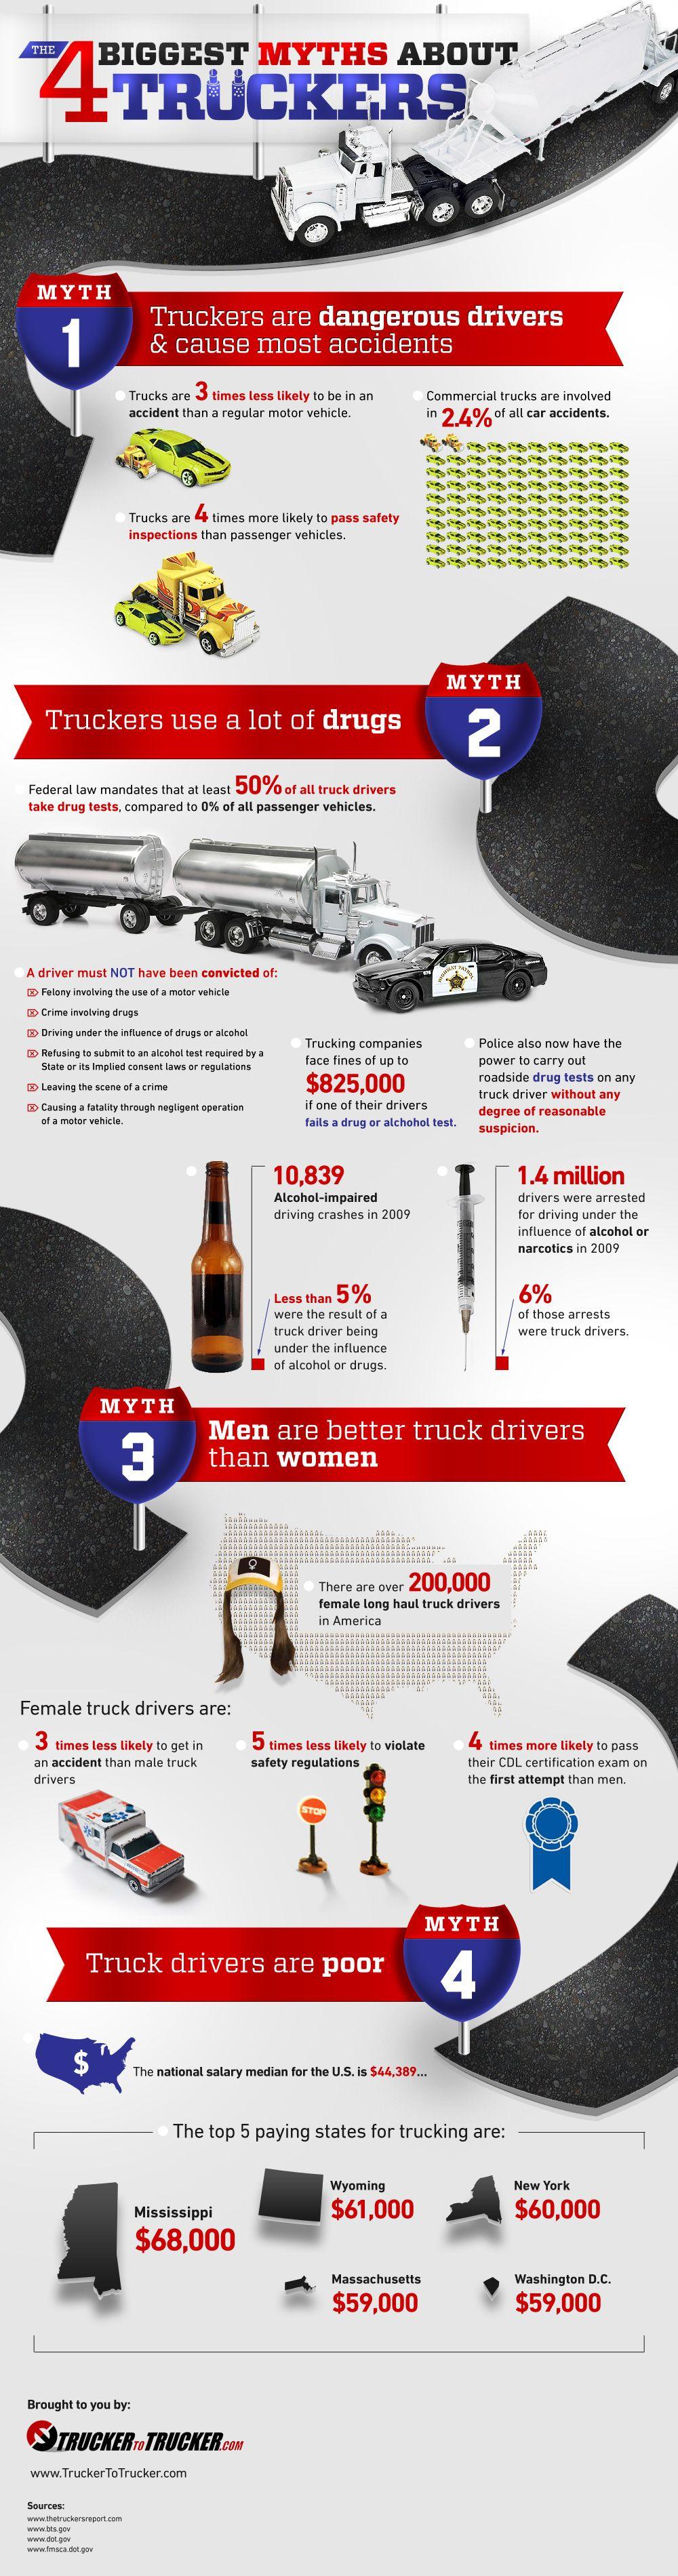 Infographic truck driver myths new trucks trucks